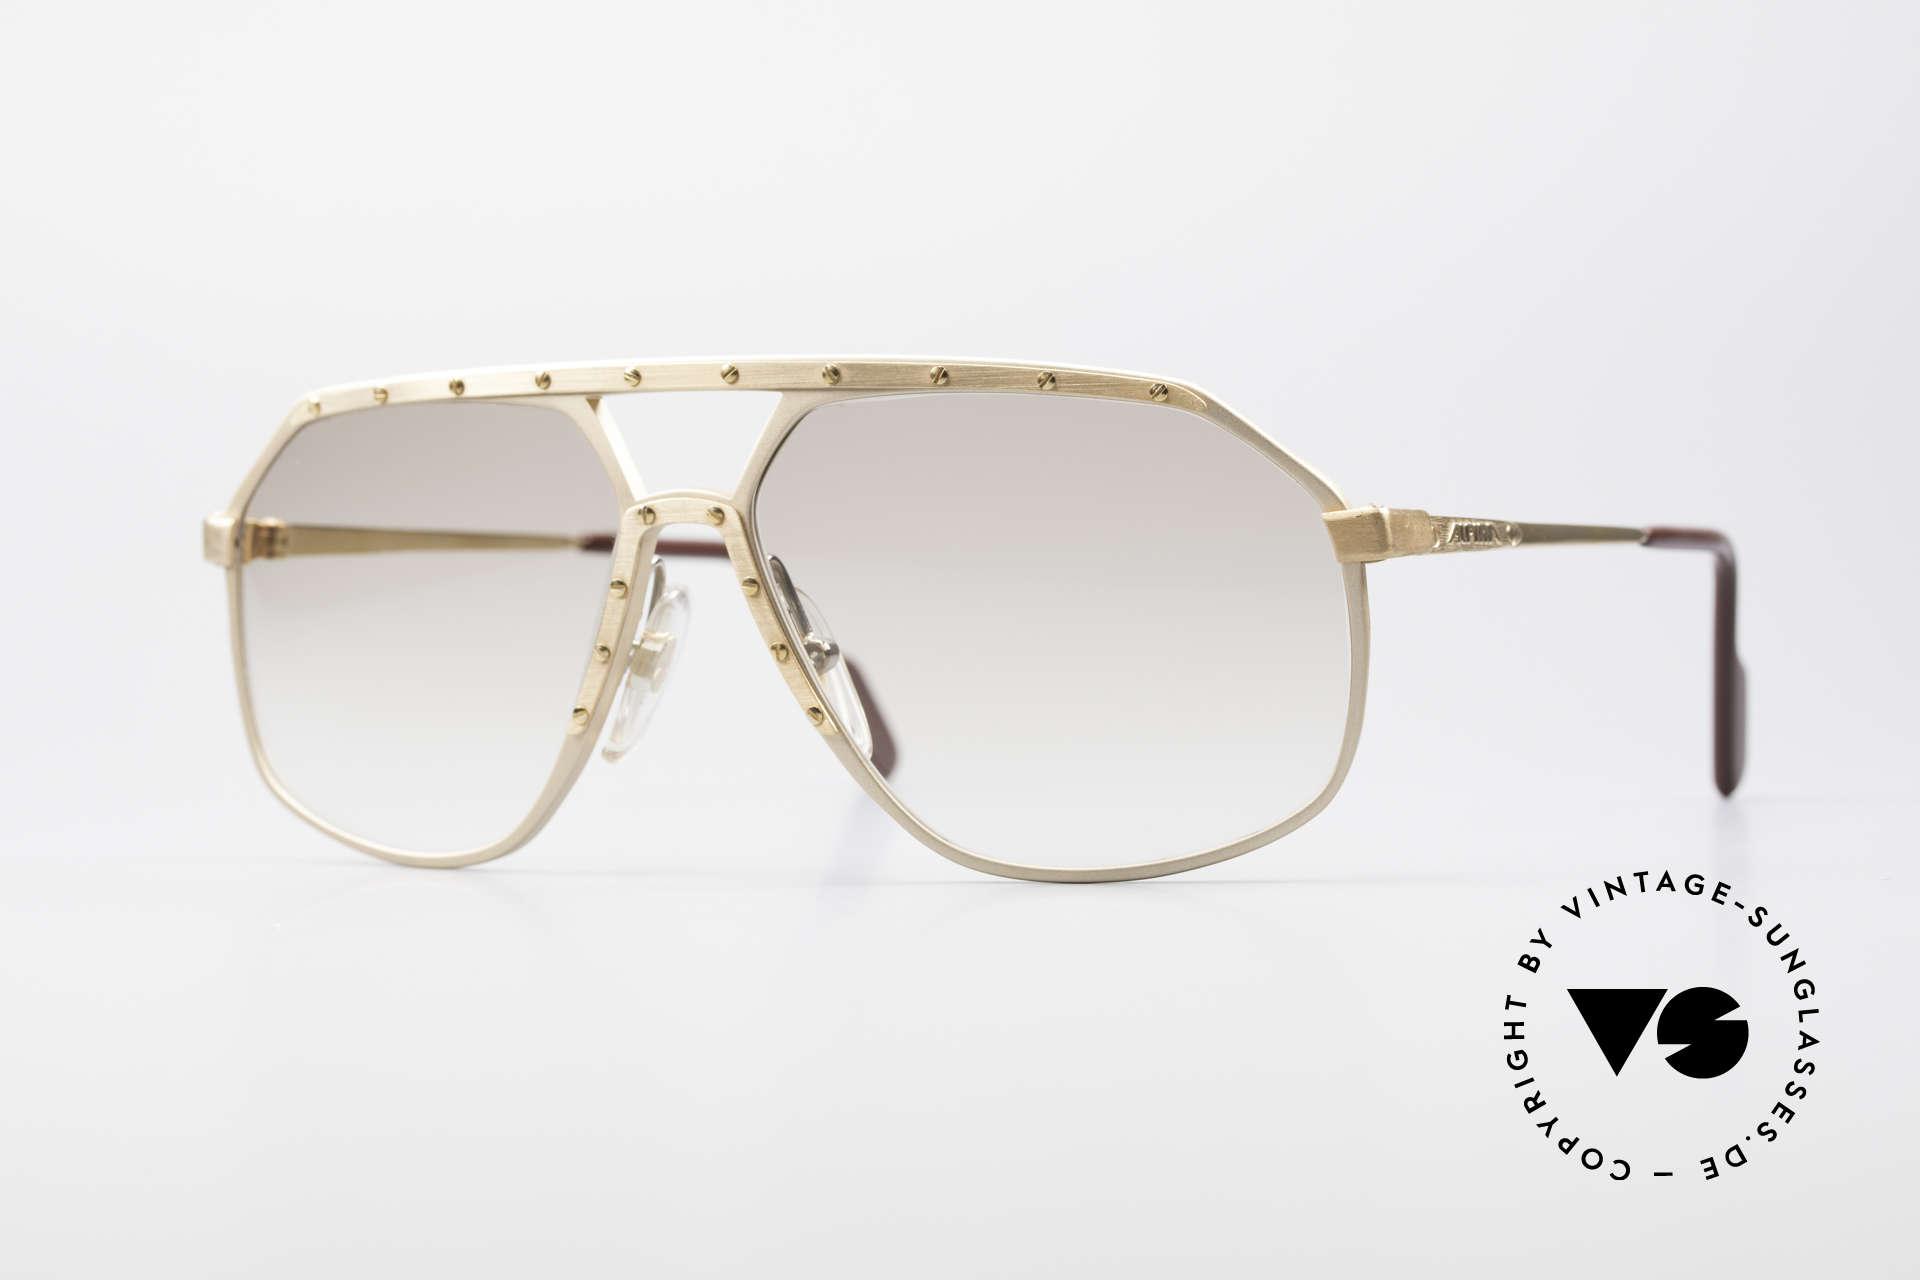 Alpina M6 Old 80's Shades True Vintage, legendary Alpina M6 vintage designer sunglasses, Made for Men